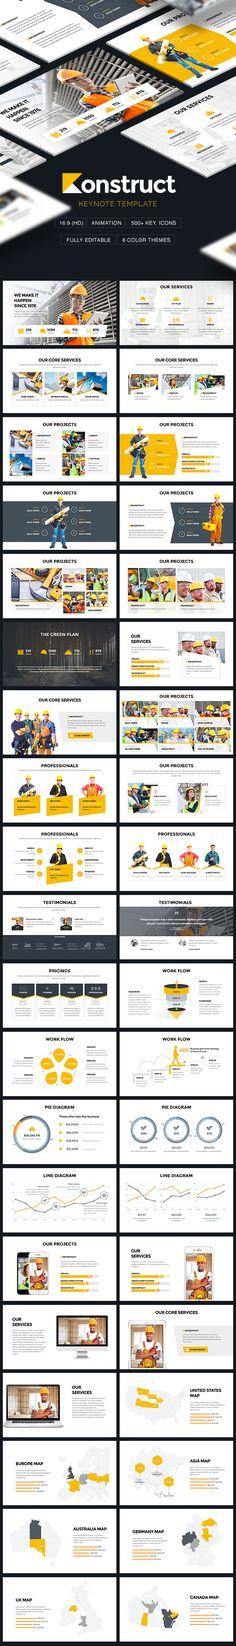 Konstruct - Construction & Architecture Theme Keynote Template - Keynote Templates Presentation Templates